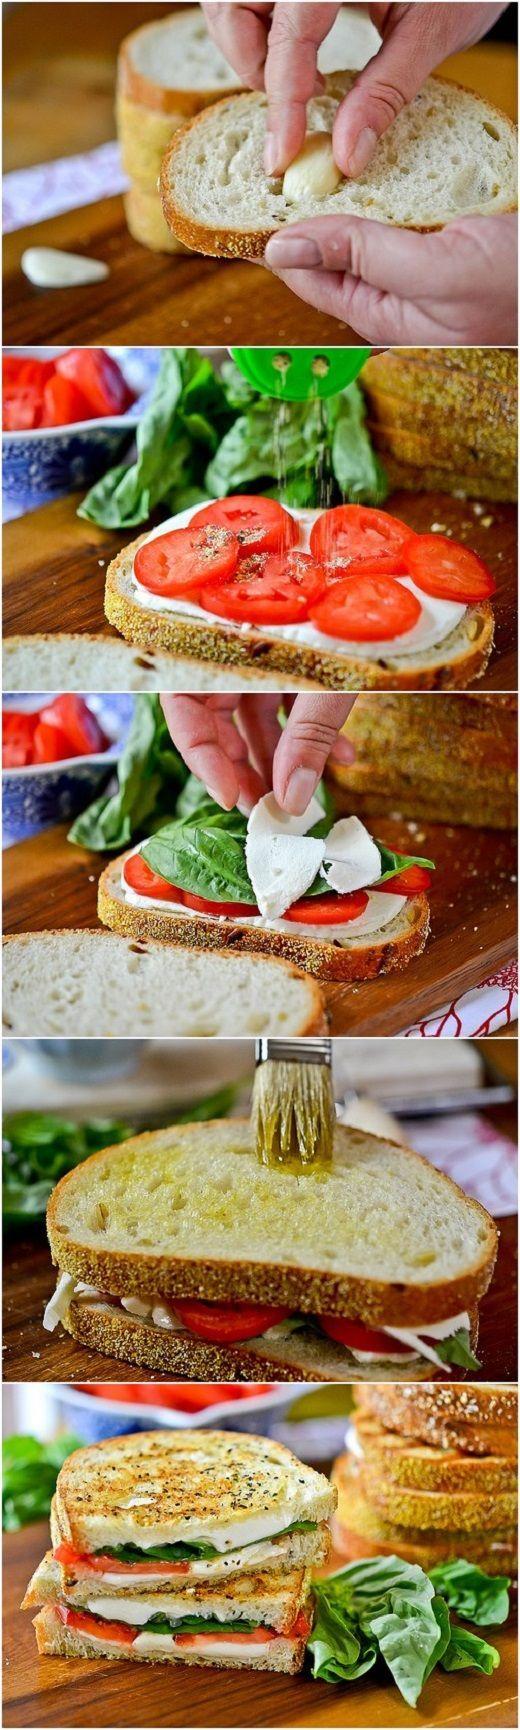 Sandwich de ajo, queso, tomate y rucula.